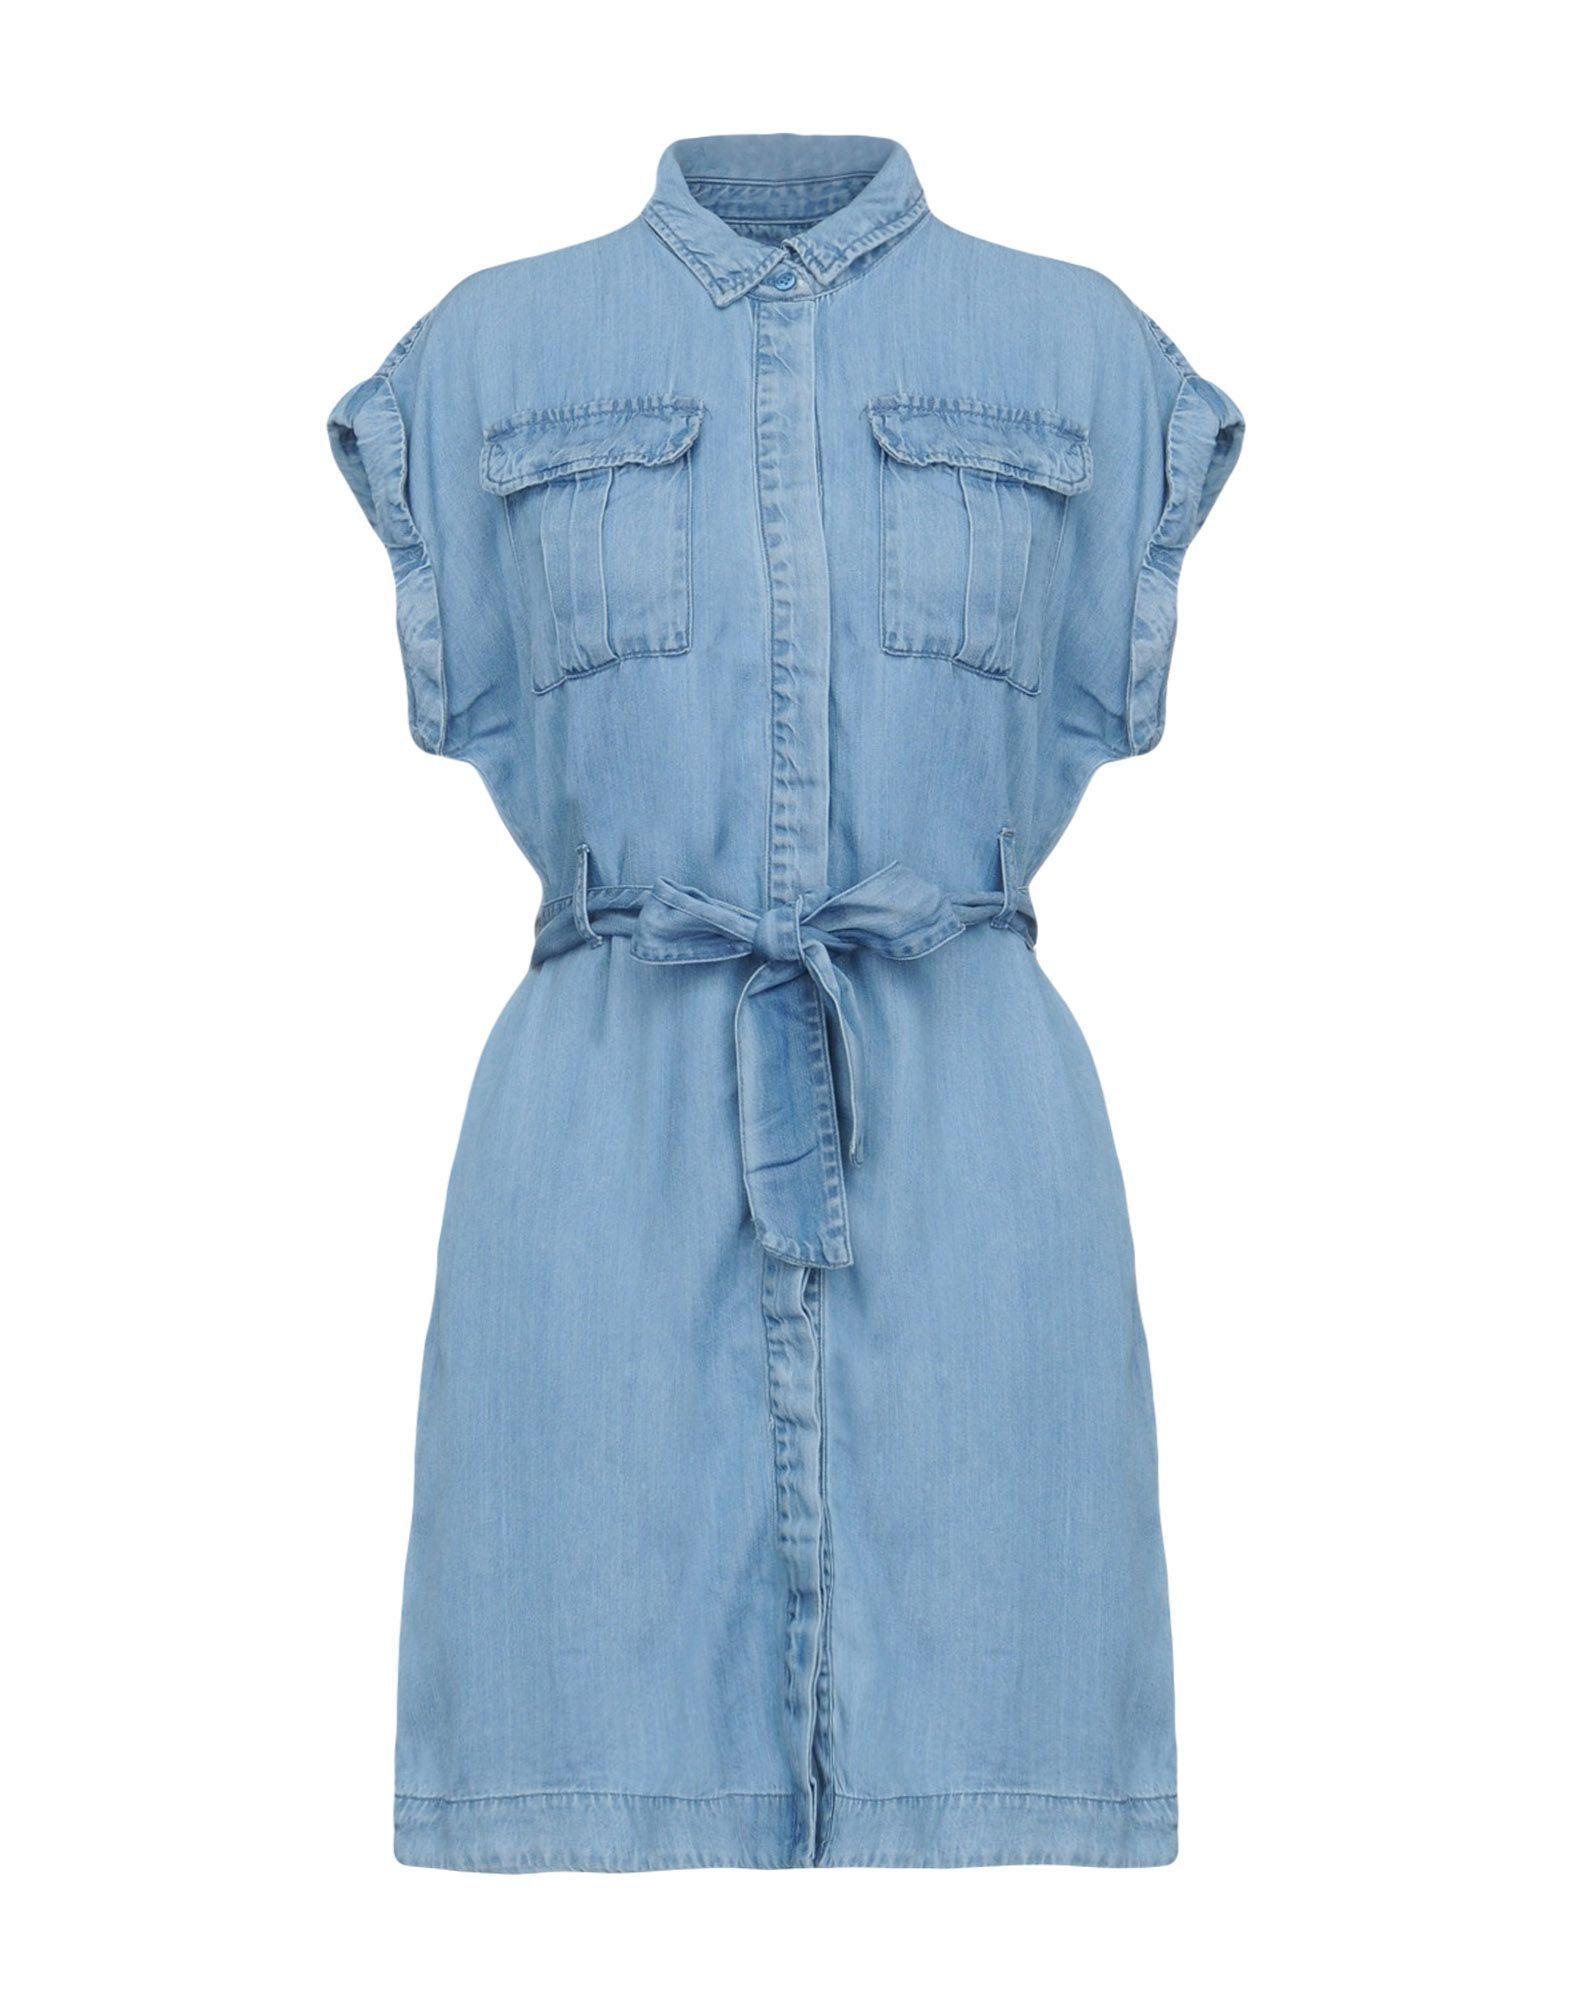 Vero Moda Blue Shirt Dress